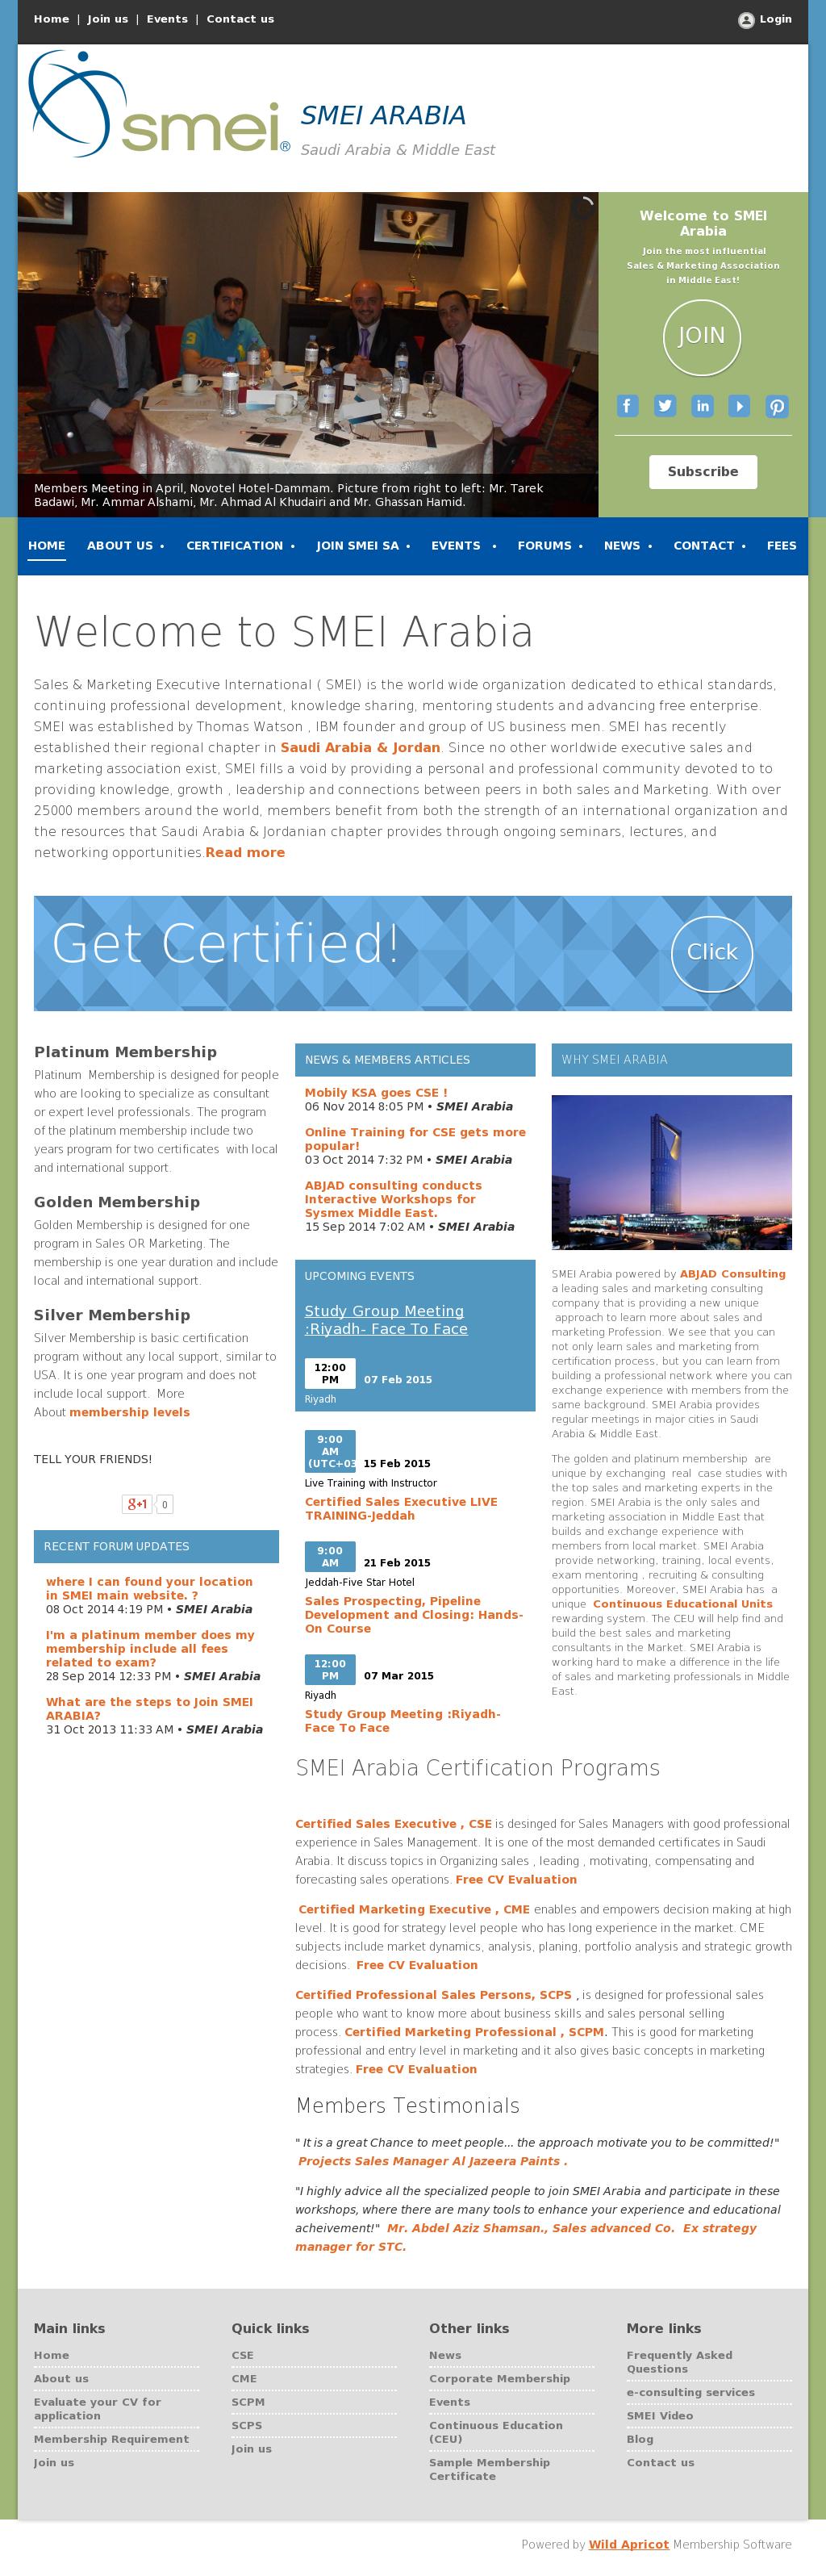 Smei Arabia Competitors, Revenue and Employees - Owler Company Profile